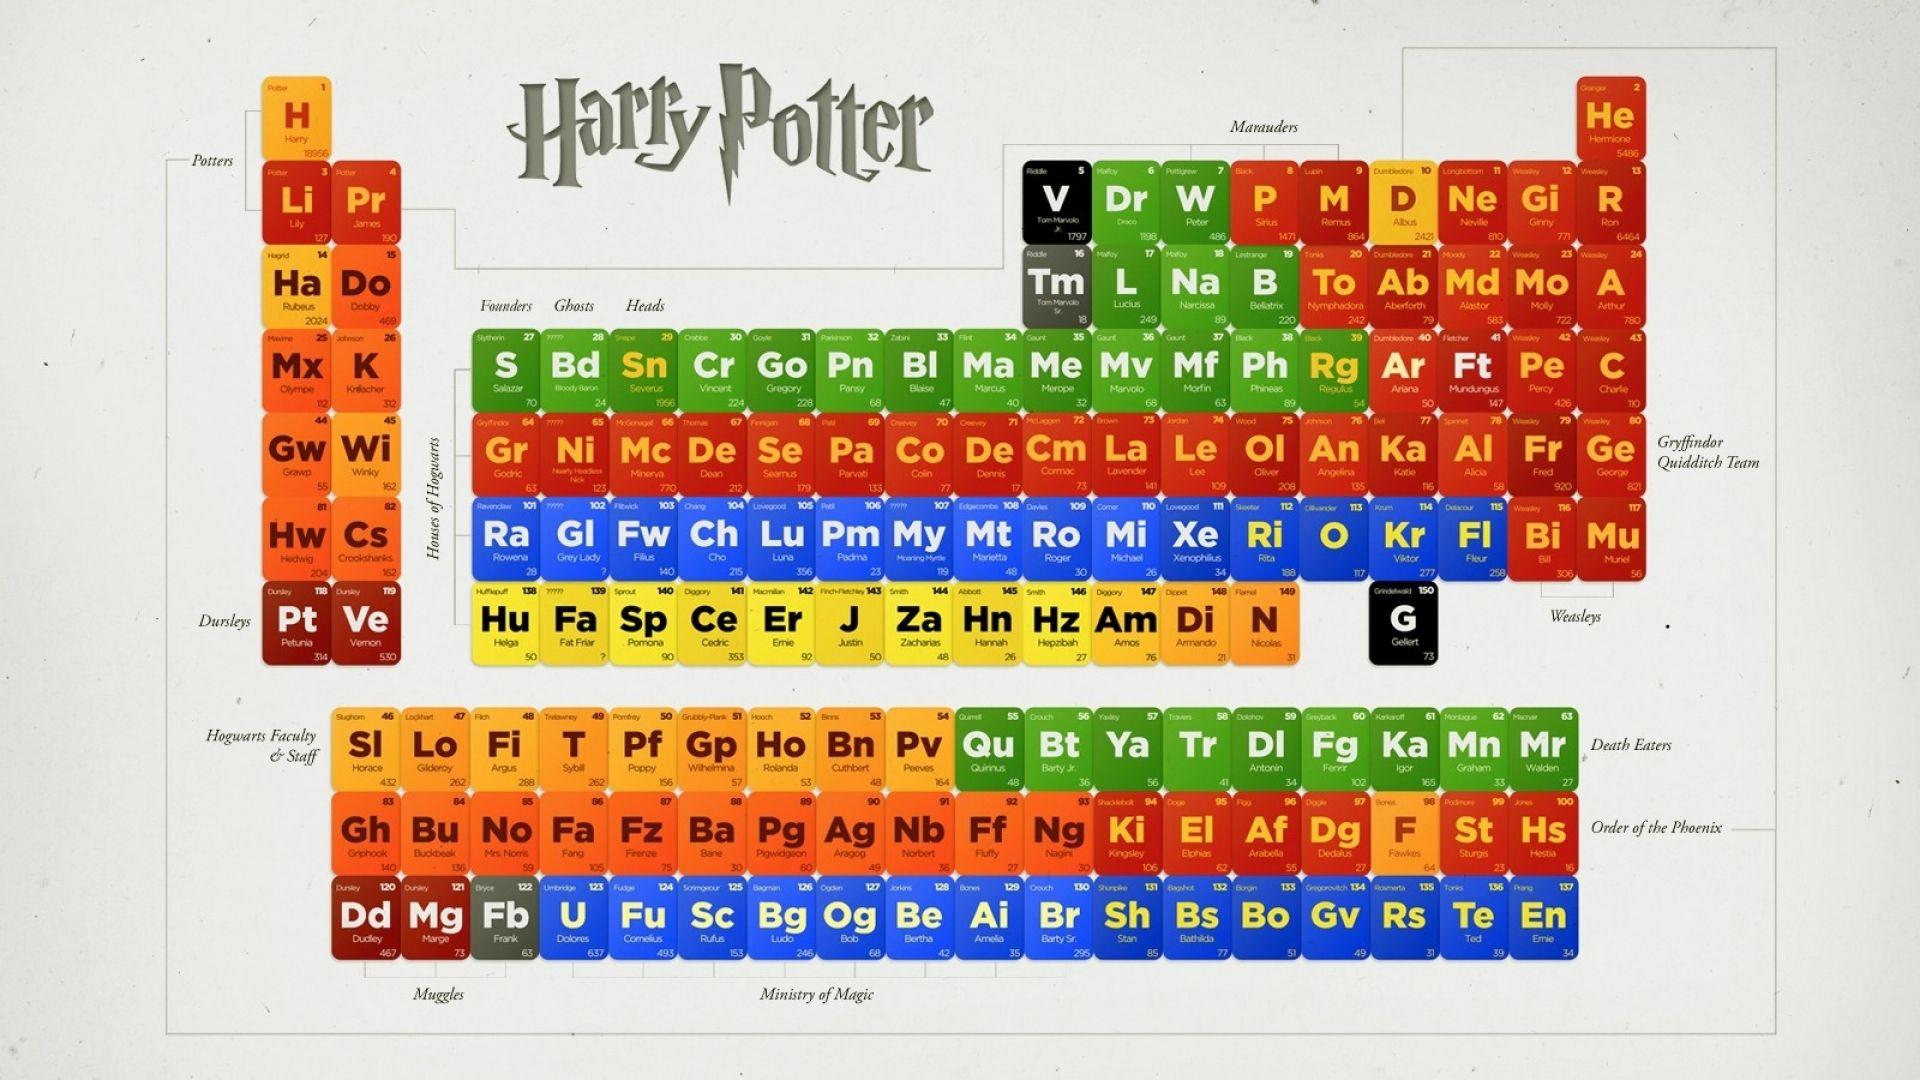 Harry Potter Periodic Table 1600x900 Wallpaper Art HD